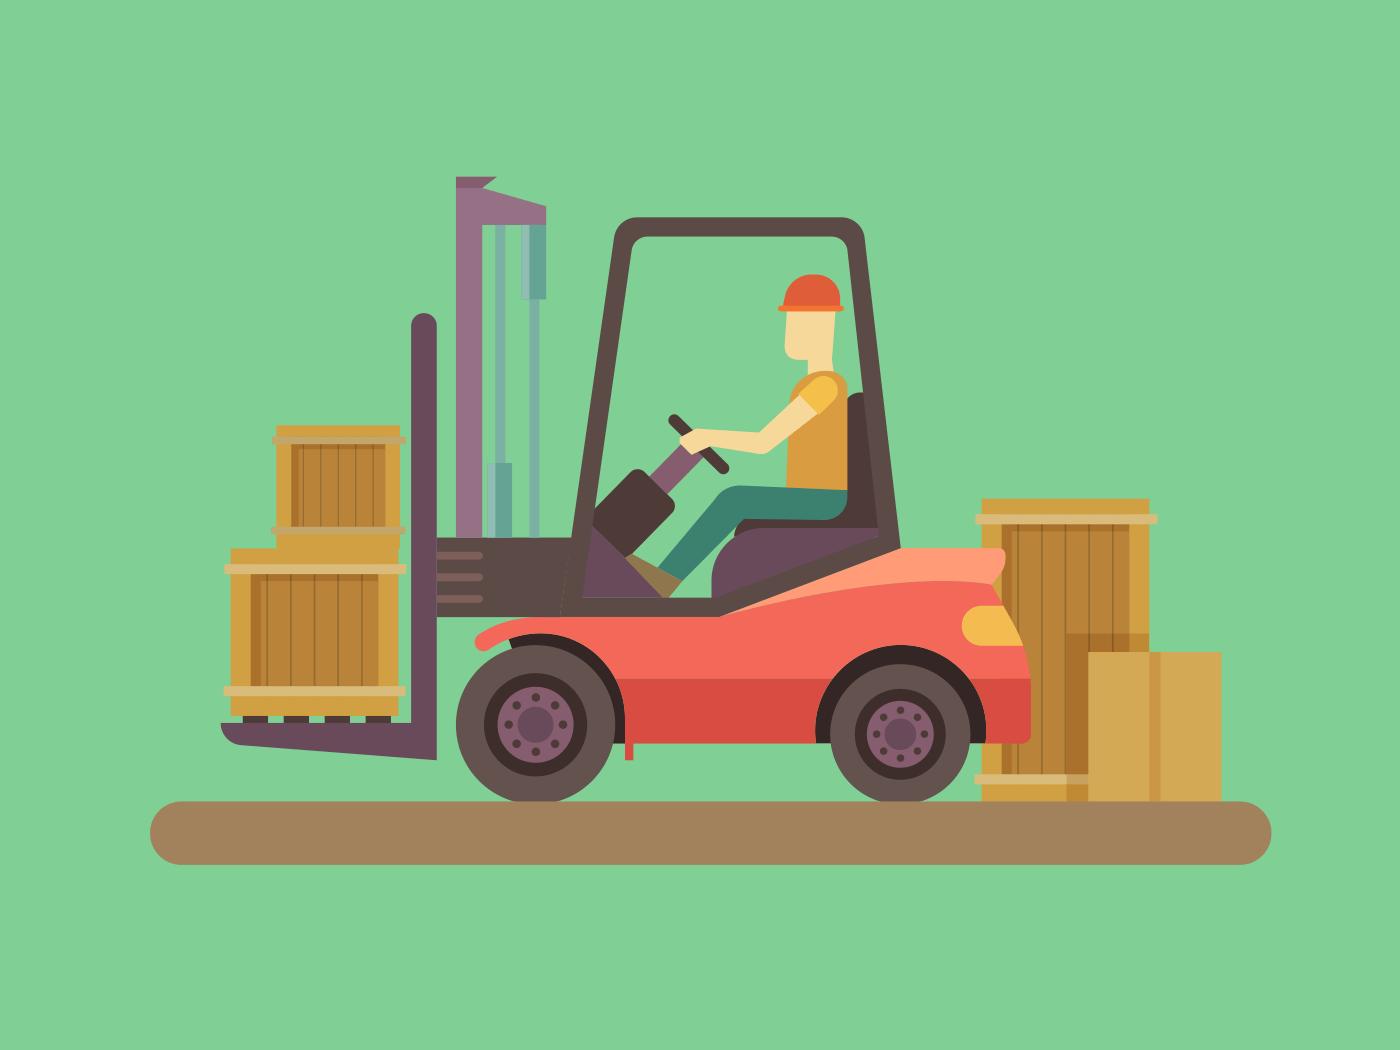 Loading and unloading machine illustration